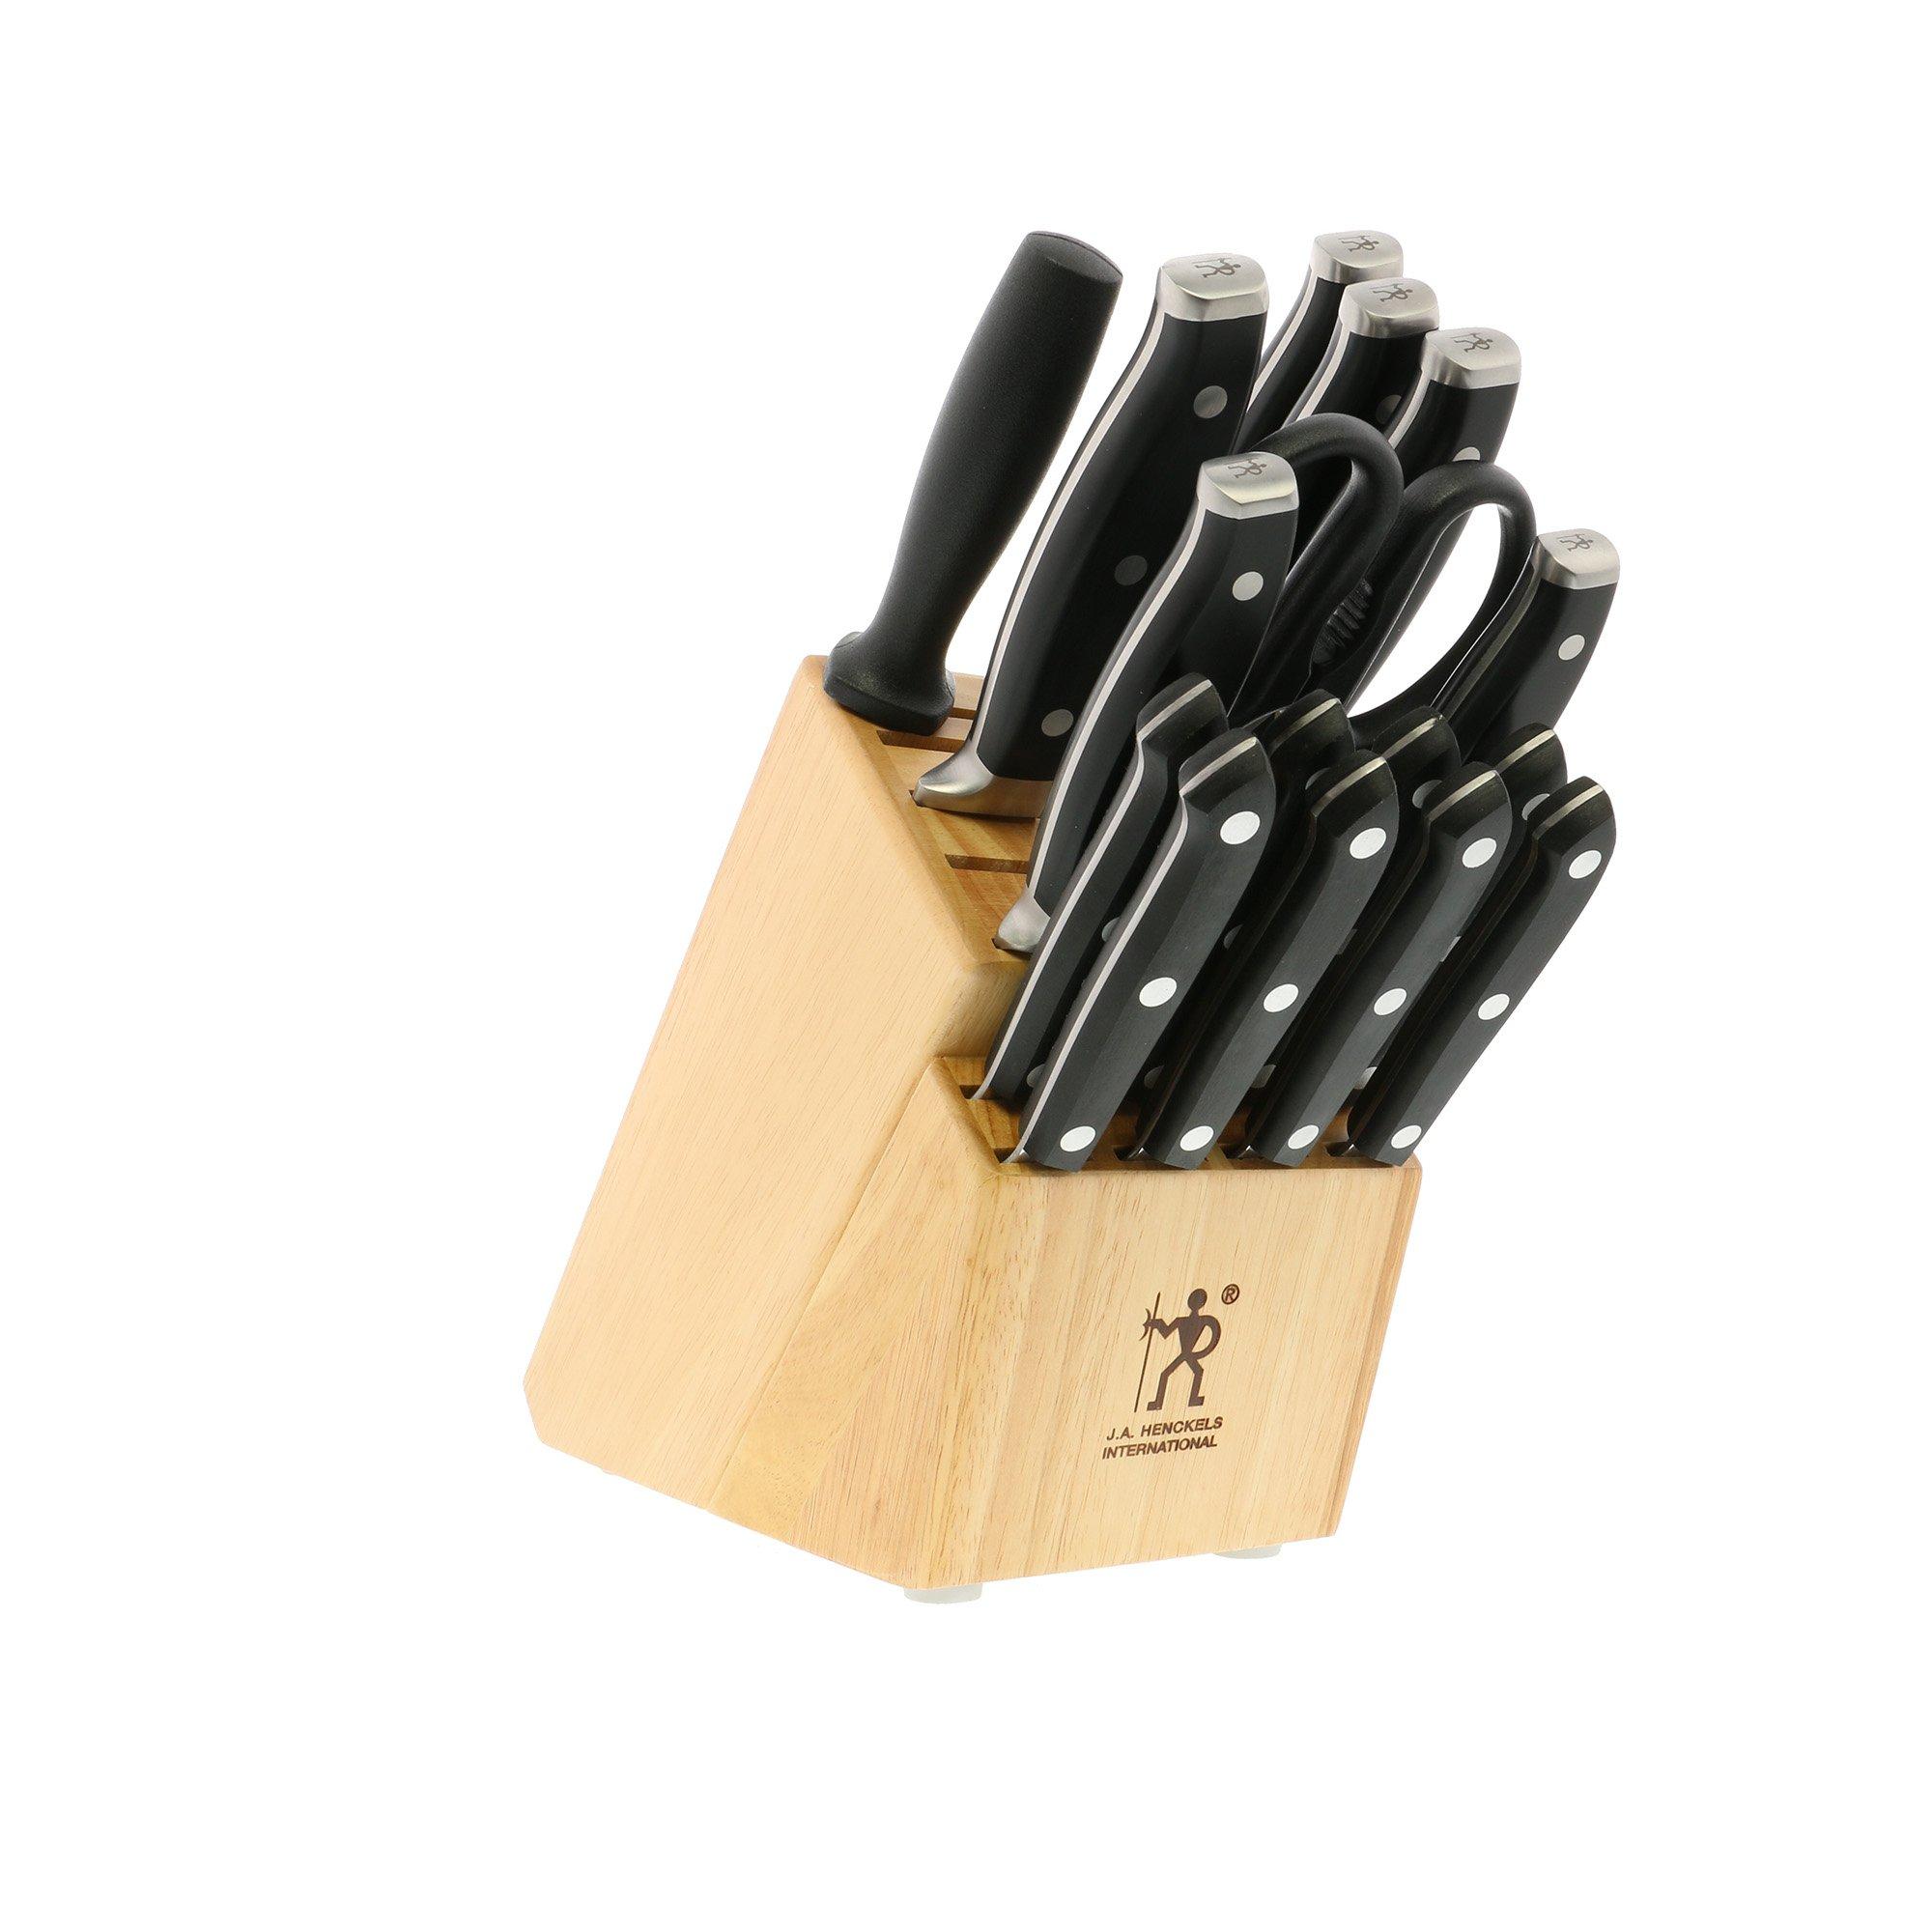 J.A. HENCKELS INTERNATIONAL Forged Premio 17-Piece Block Knife Set